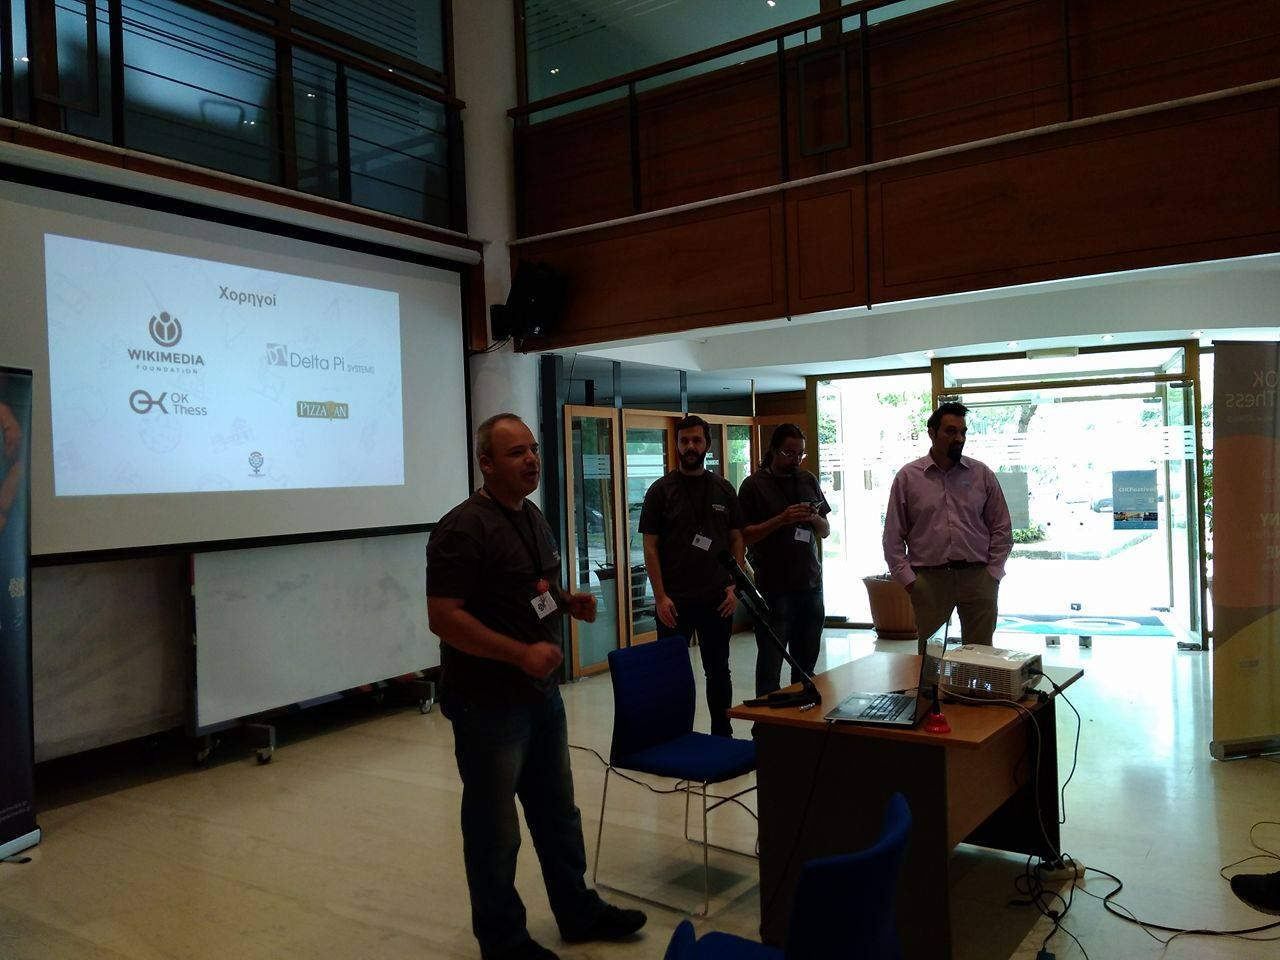 WikiFemHack Thessaloniki: Οριοθετώντας τις φυλετικές ανισότητες στην τεχνολογία